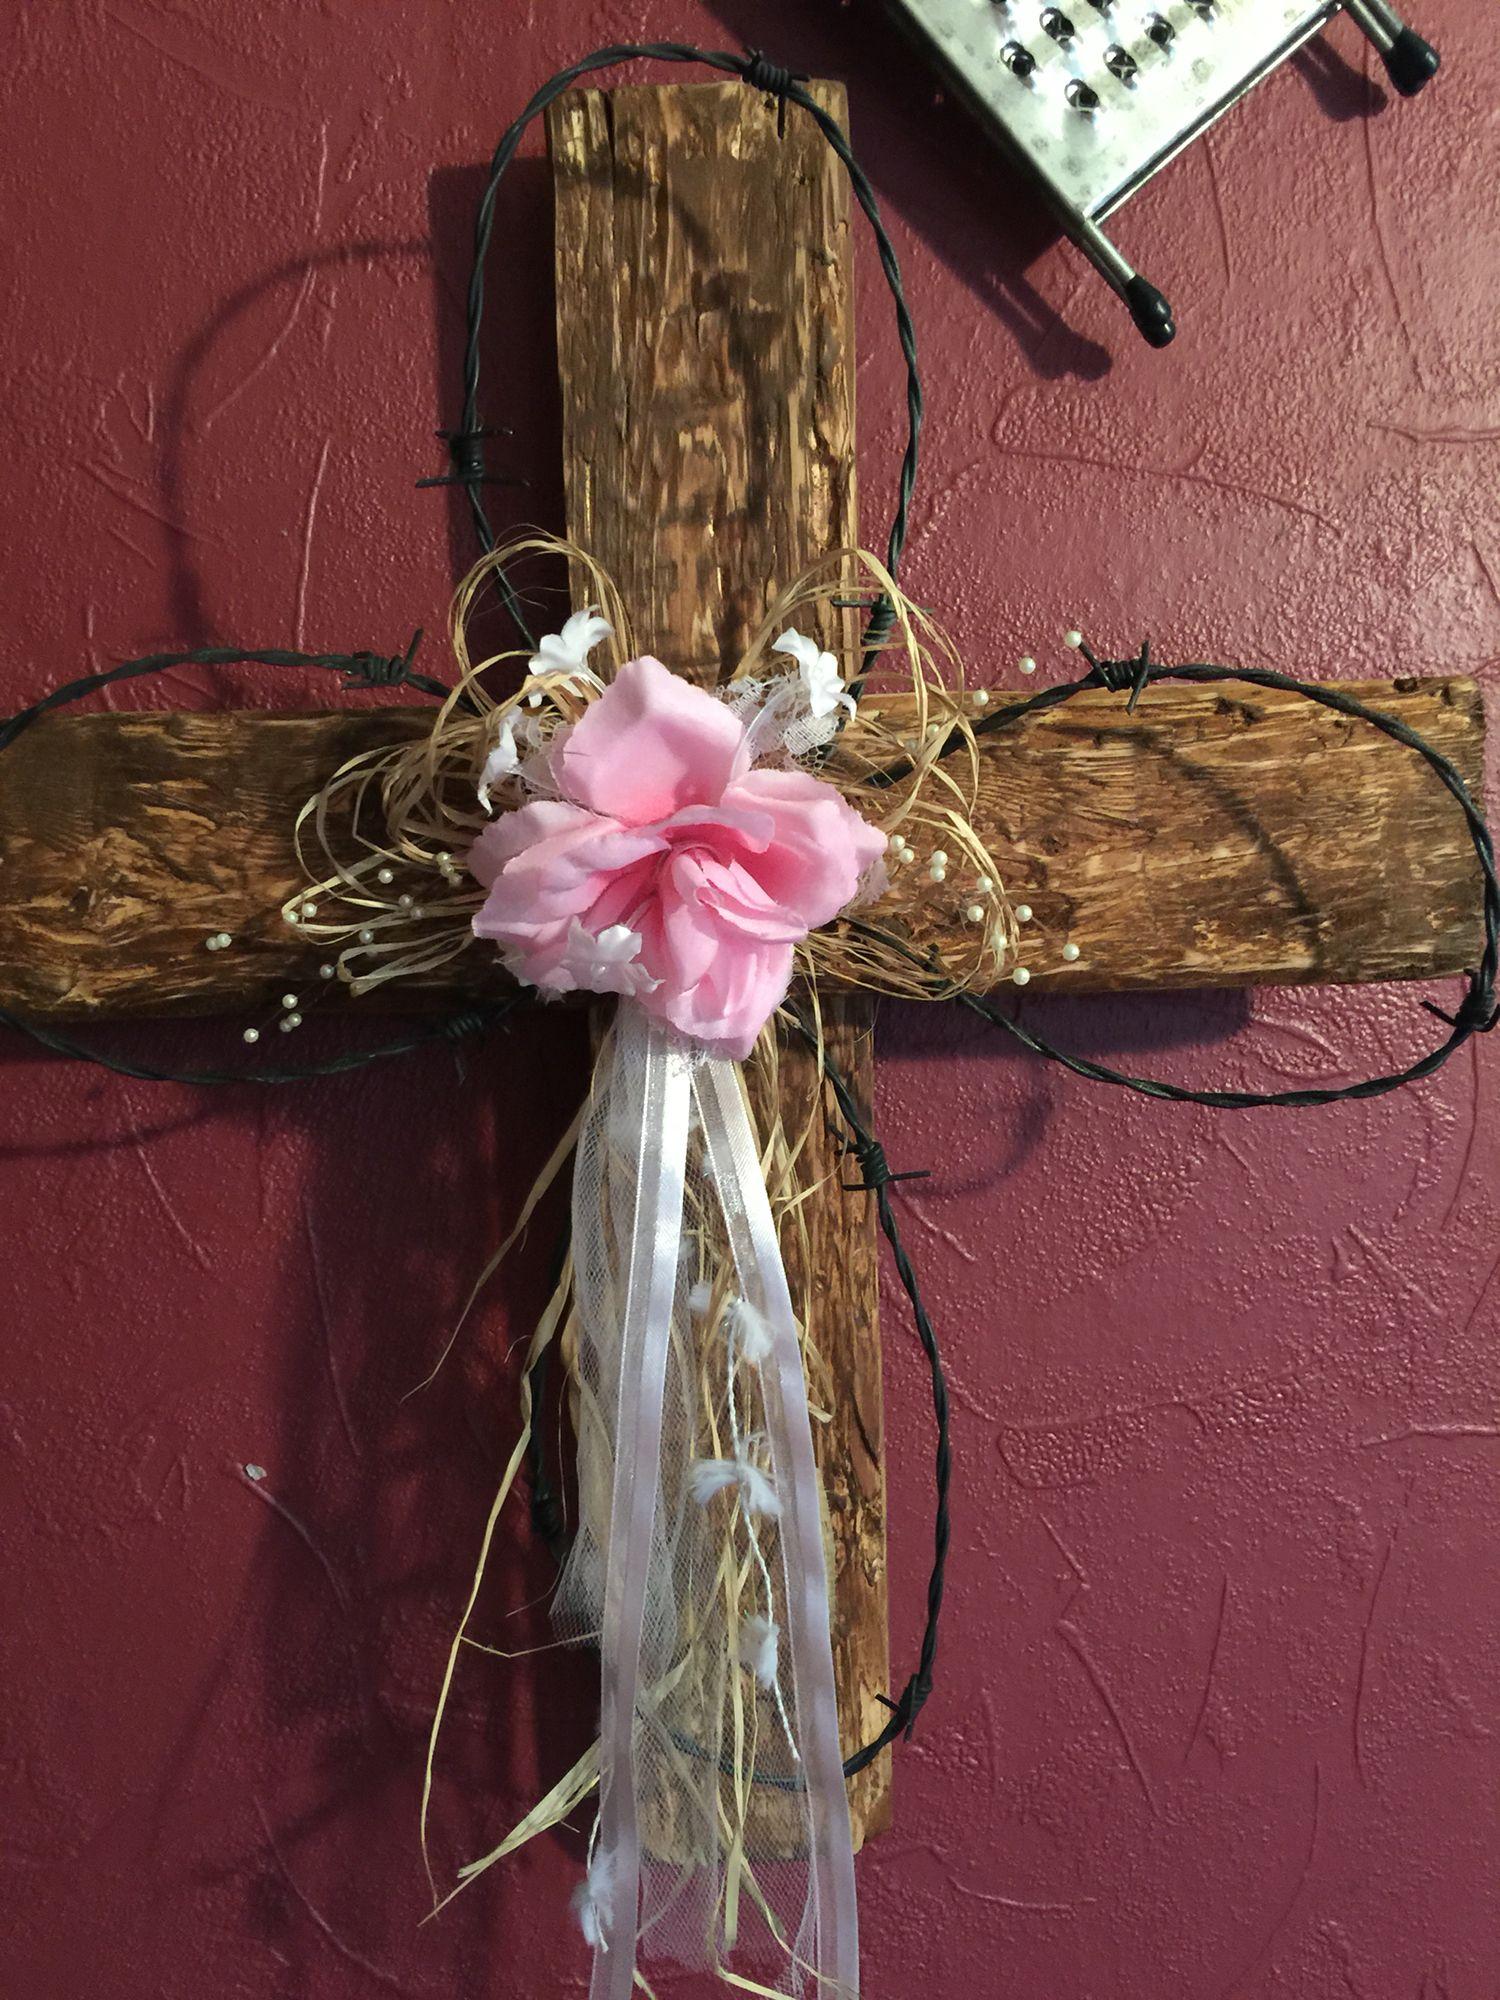 Diy pallet cross | Pallet cross, Pallet diy, Grapevine wreath